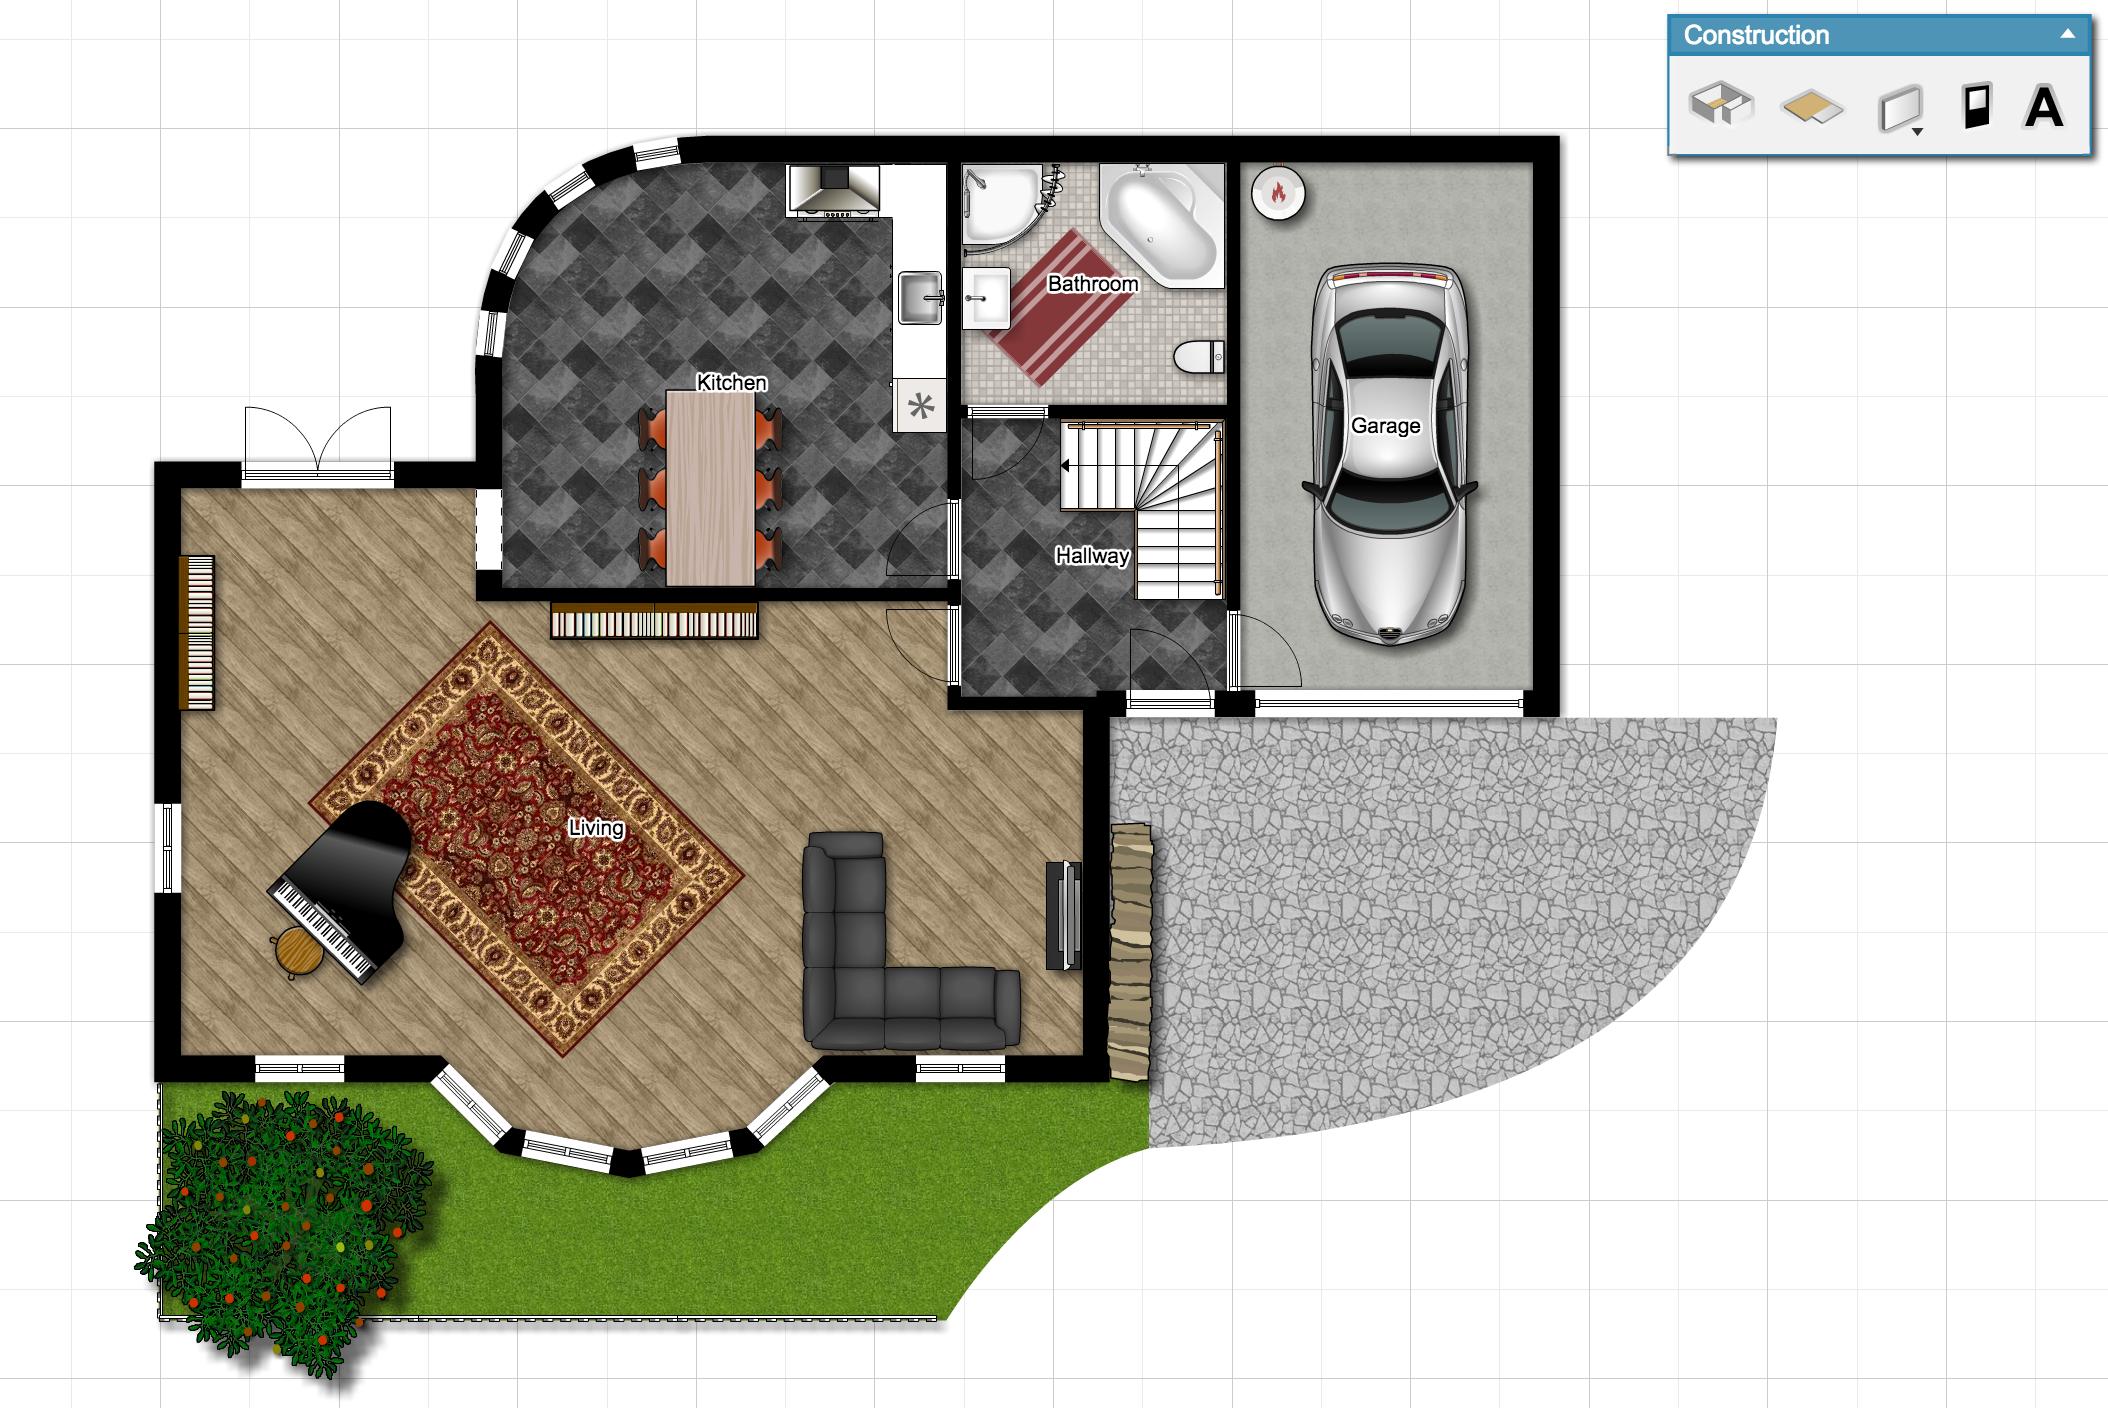 20 Home Design Software Programs (Interior & Outdoor